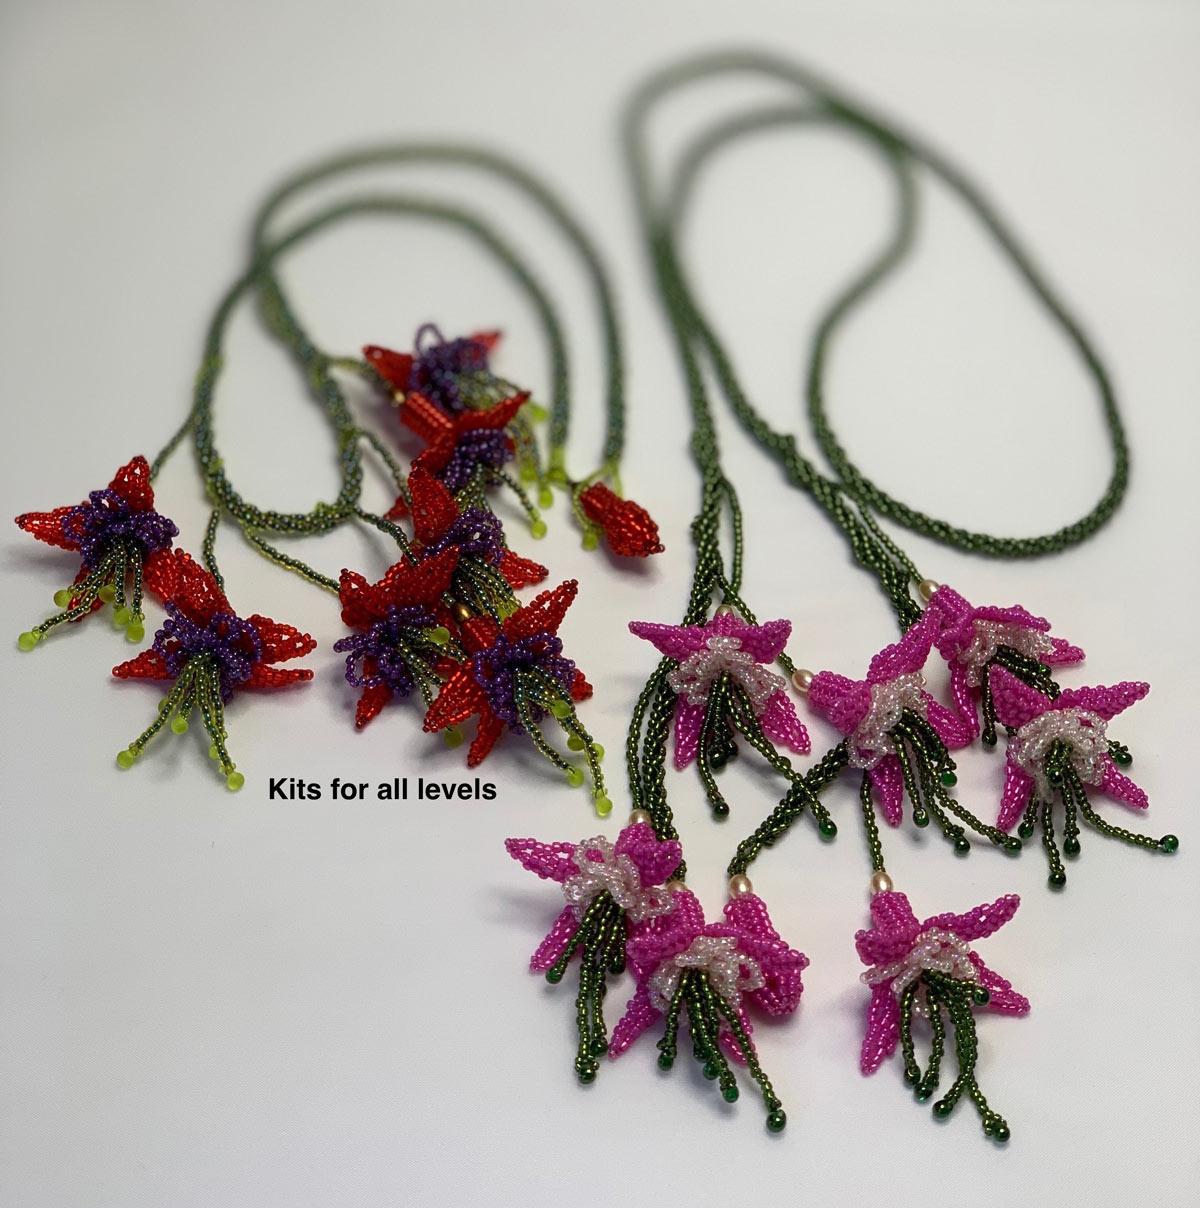 Kiss Beads Kits